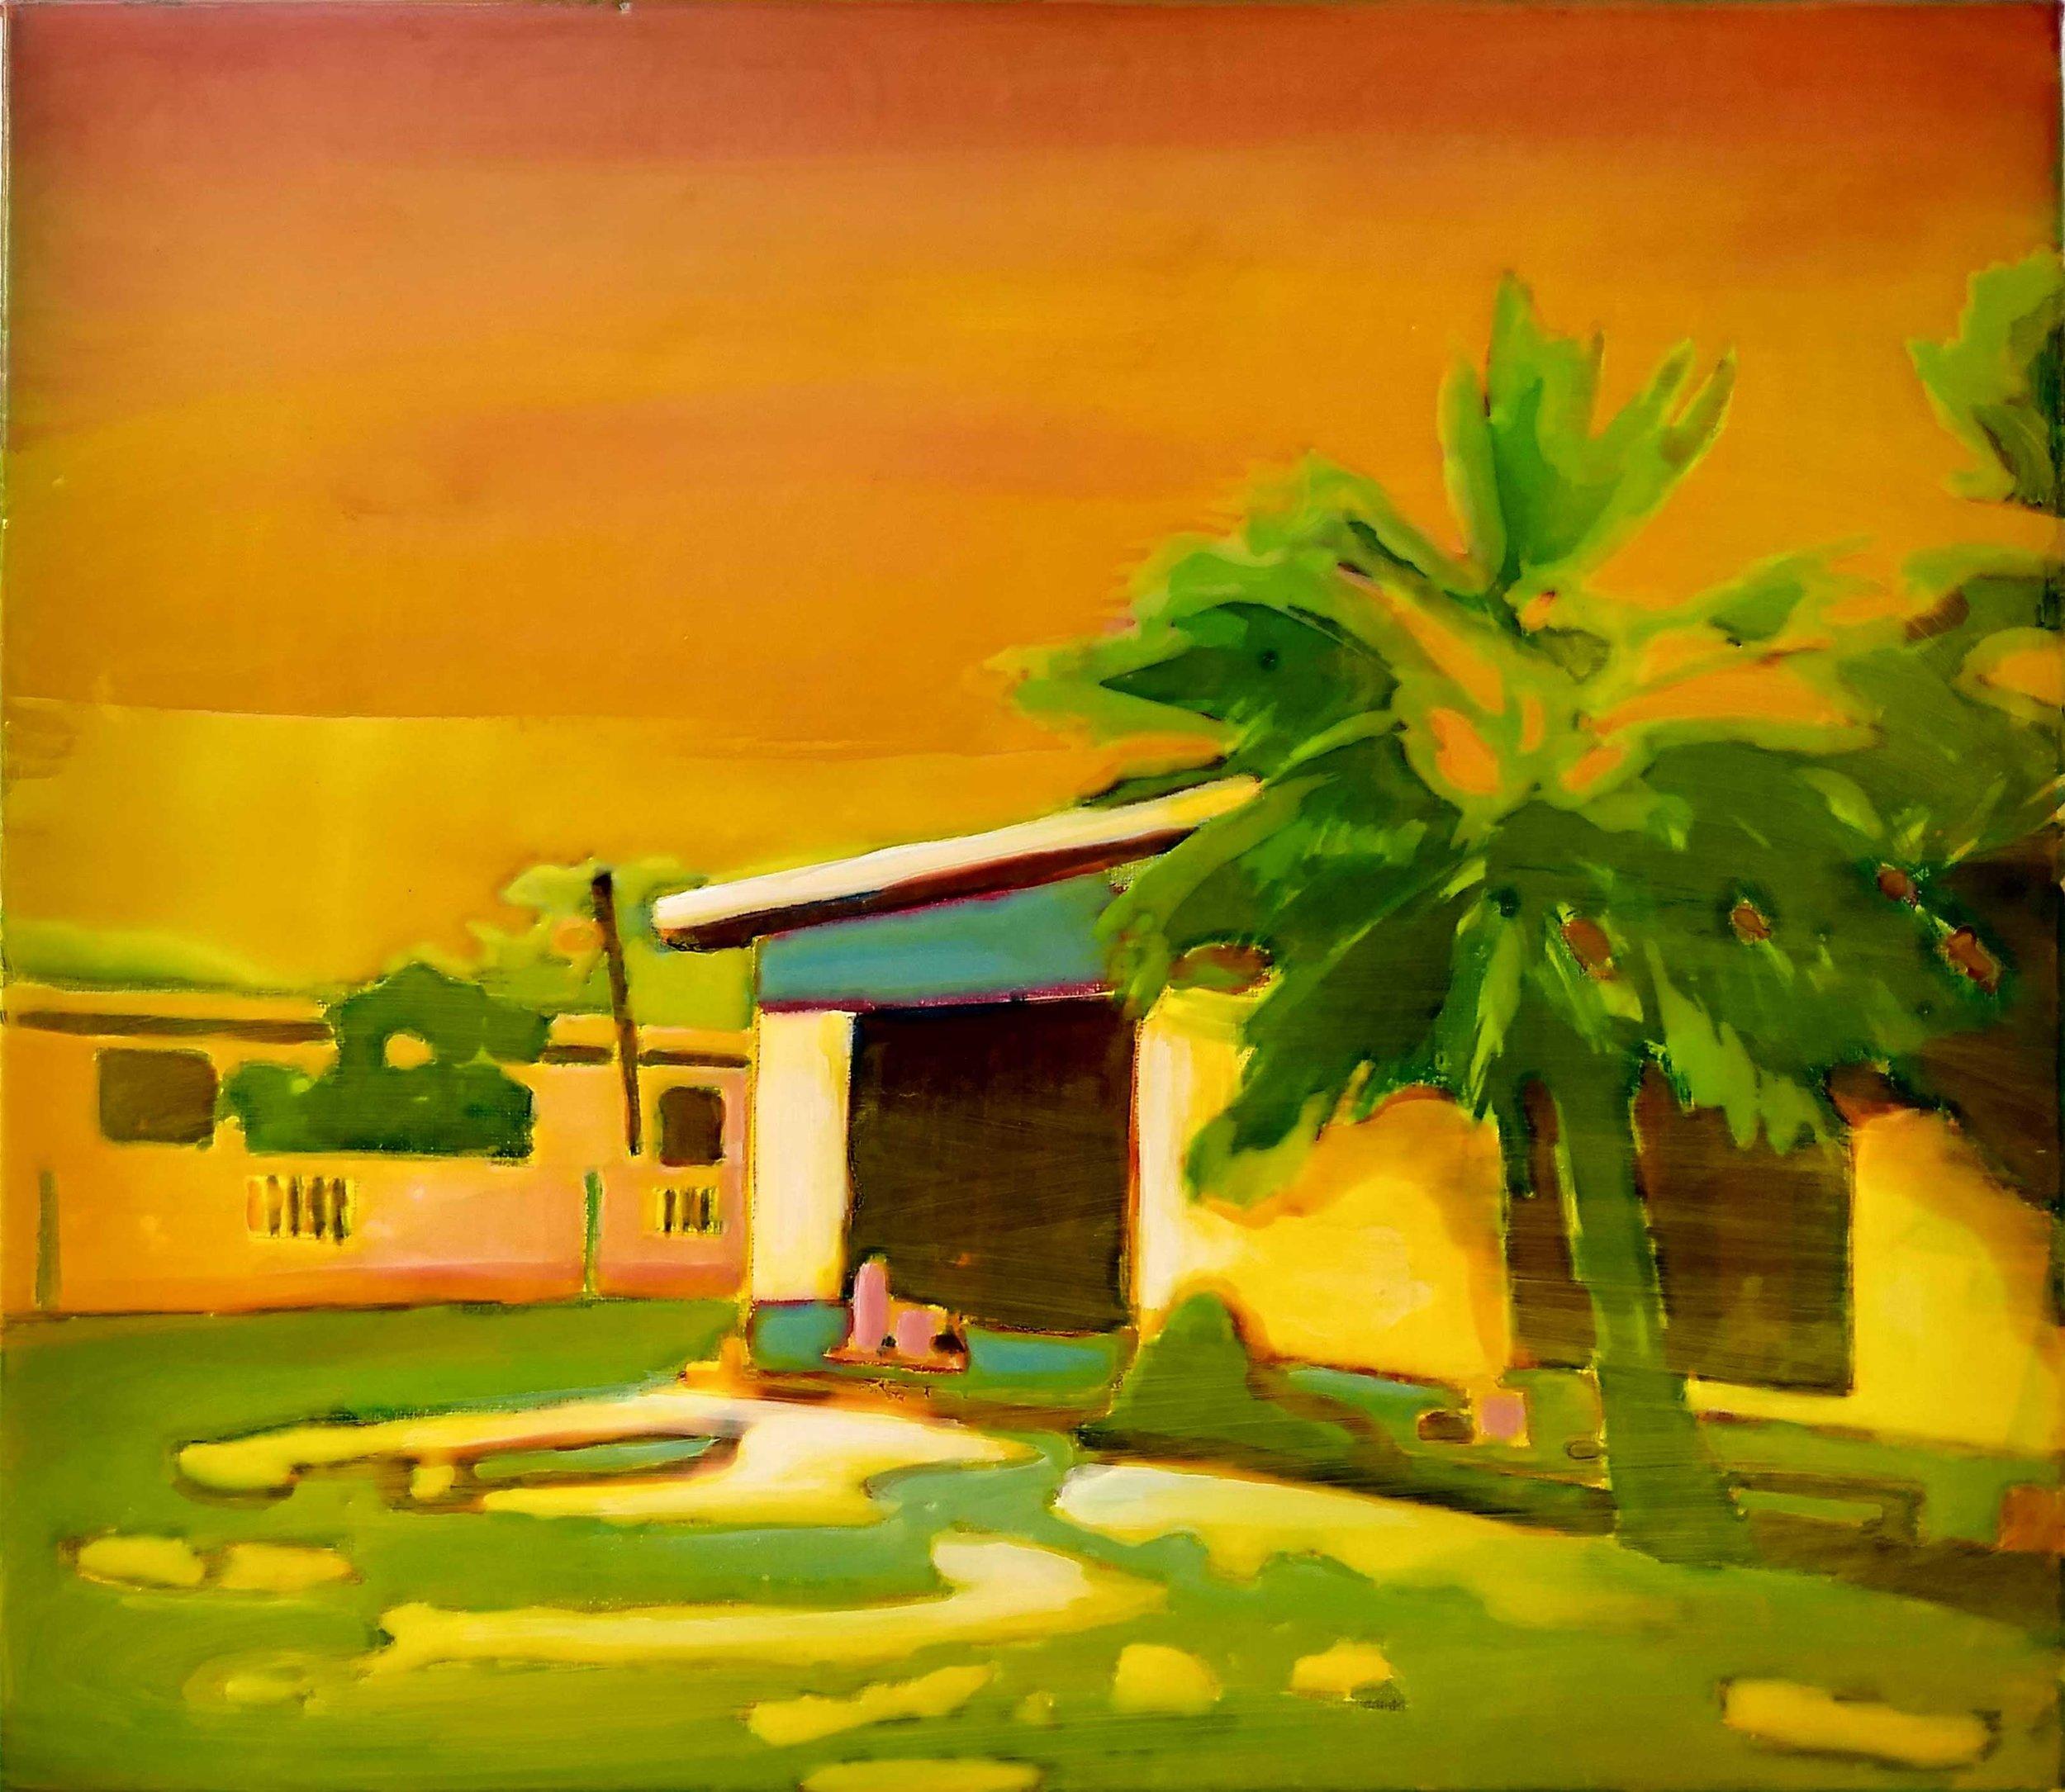 FORTUNA ARIBA  40 x 45 cm Acrylic and epoxy on canvas